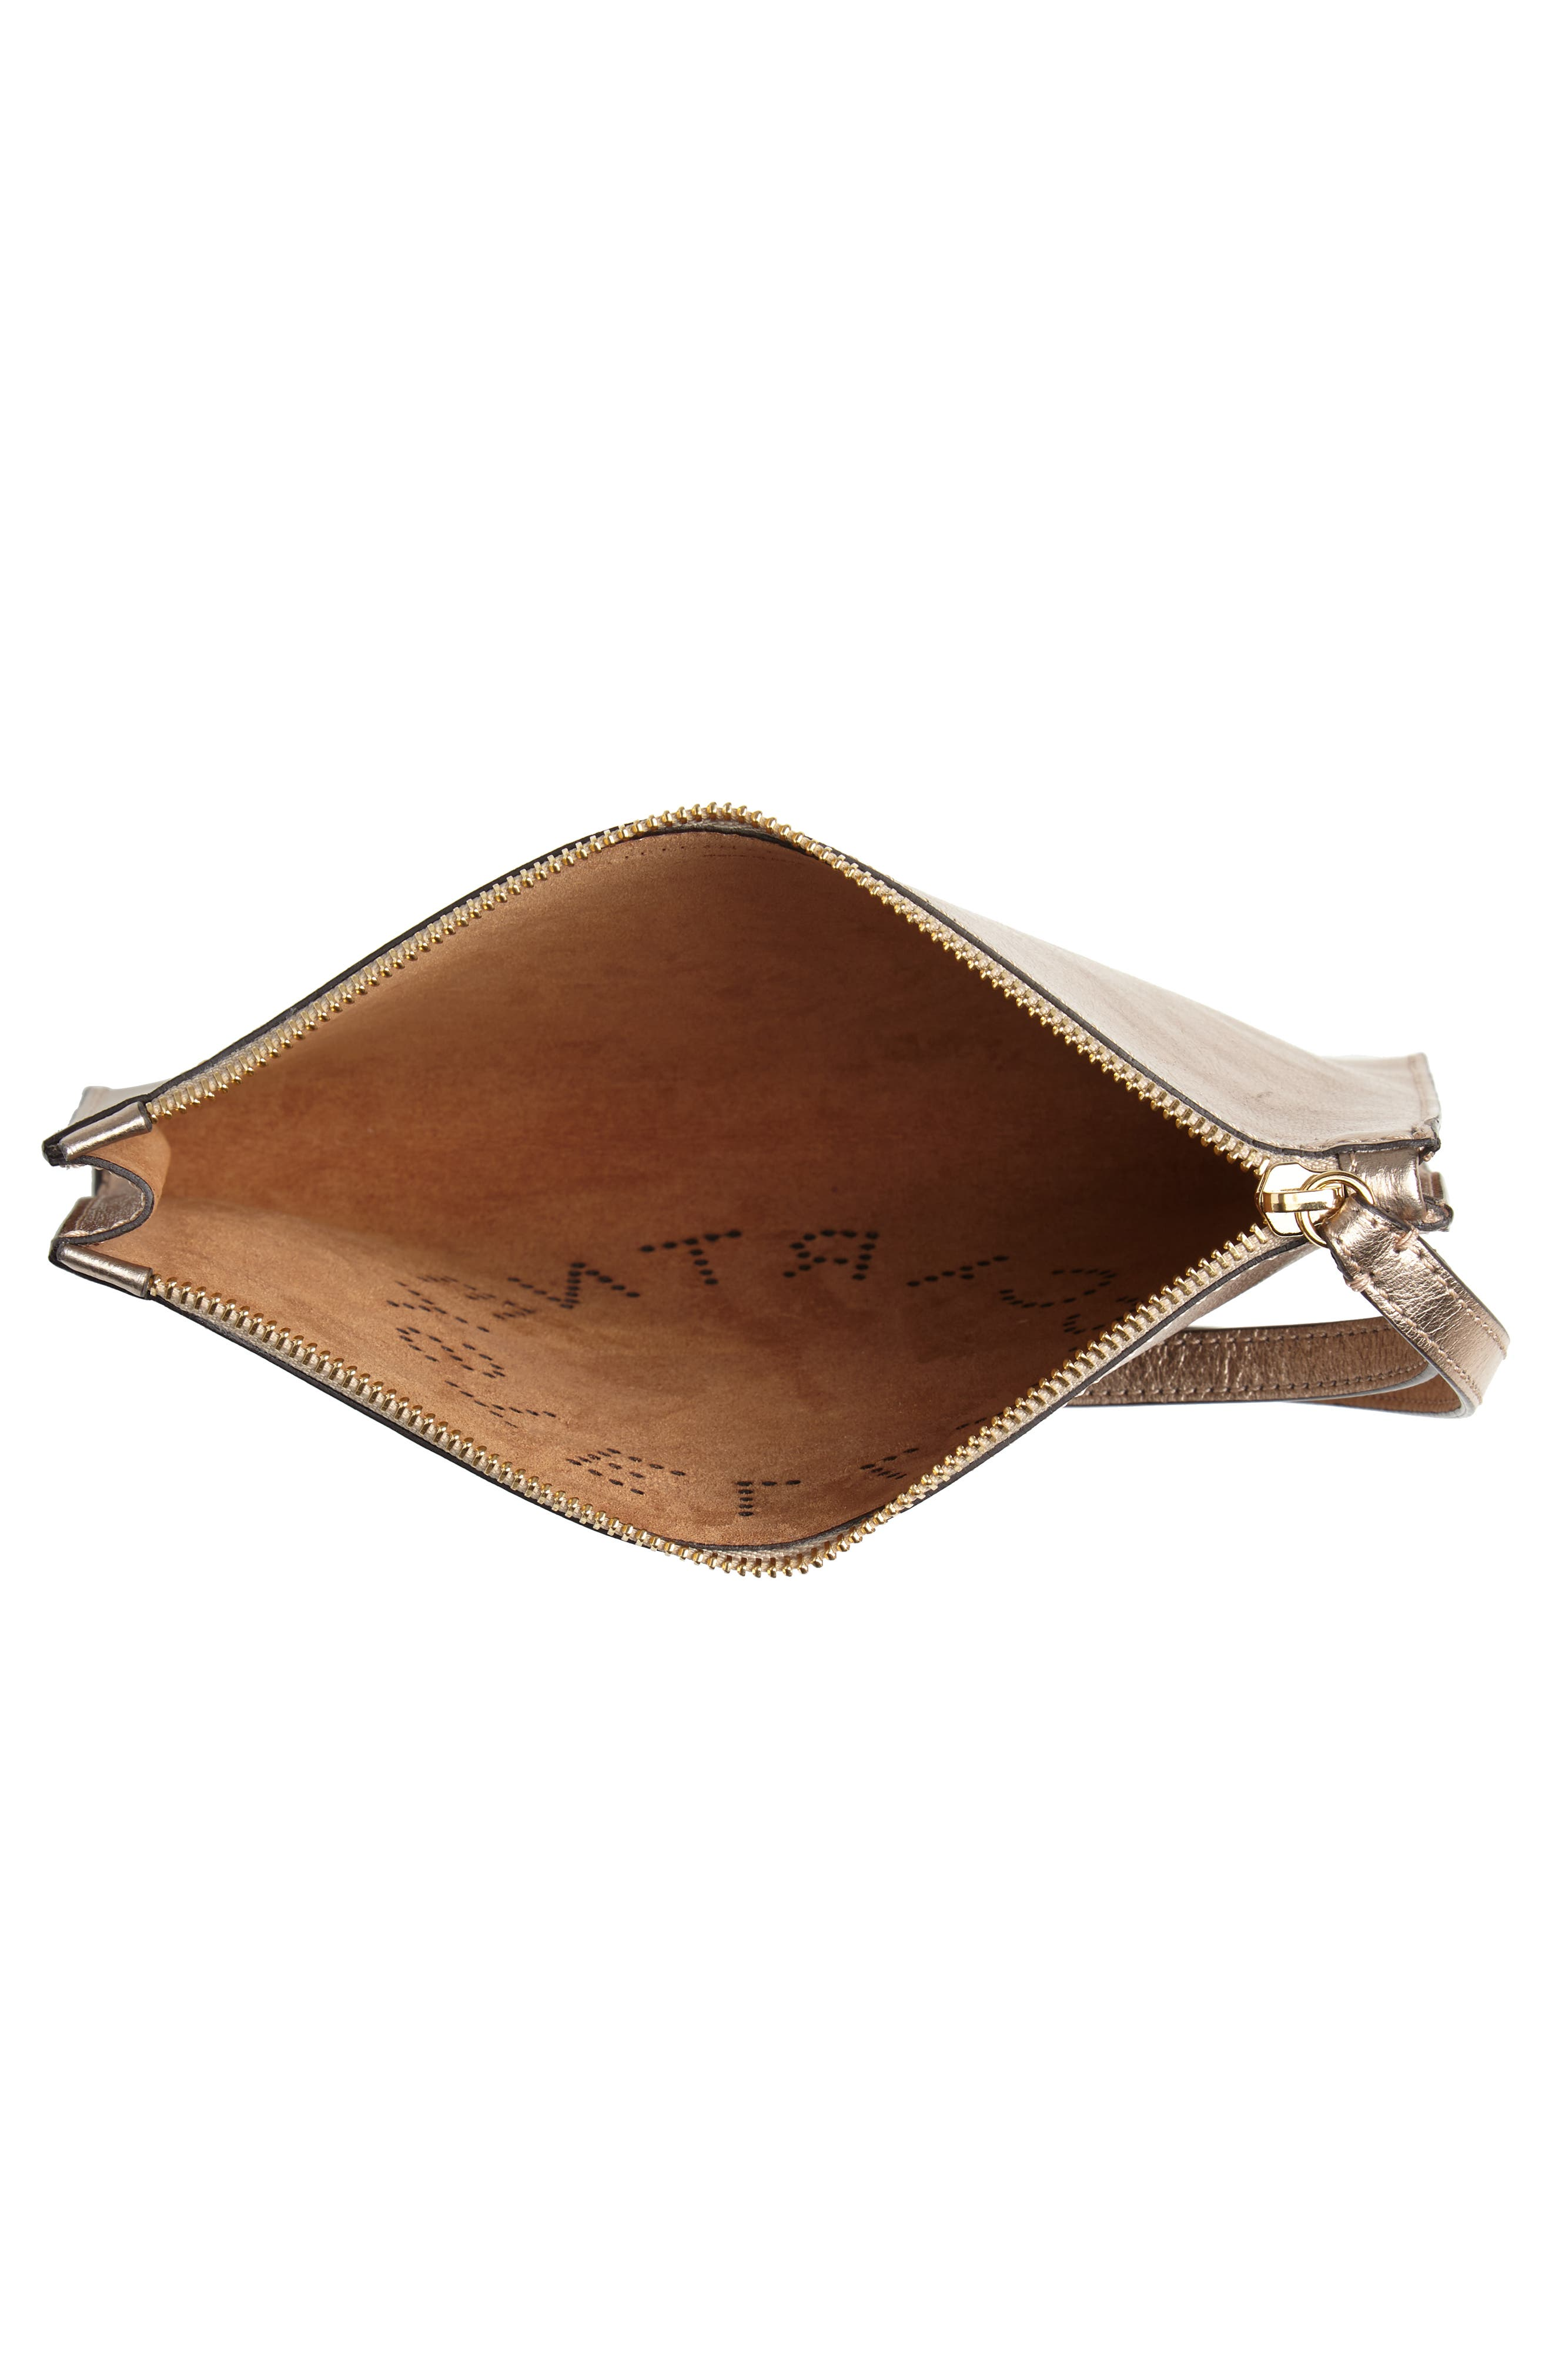 STELLA MCCARTNEY, Metallic Faux Nappa Leather Wristlet Clutch, Alternate thumbnail 4, color, 715